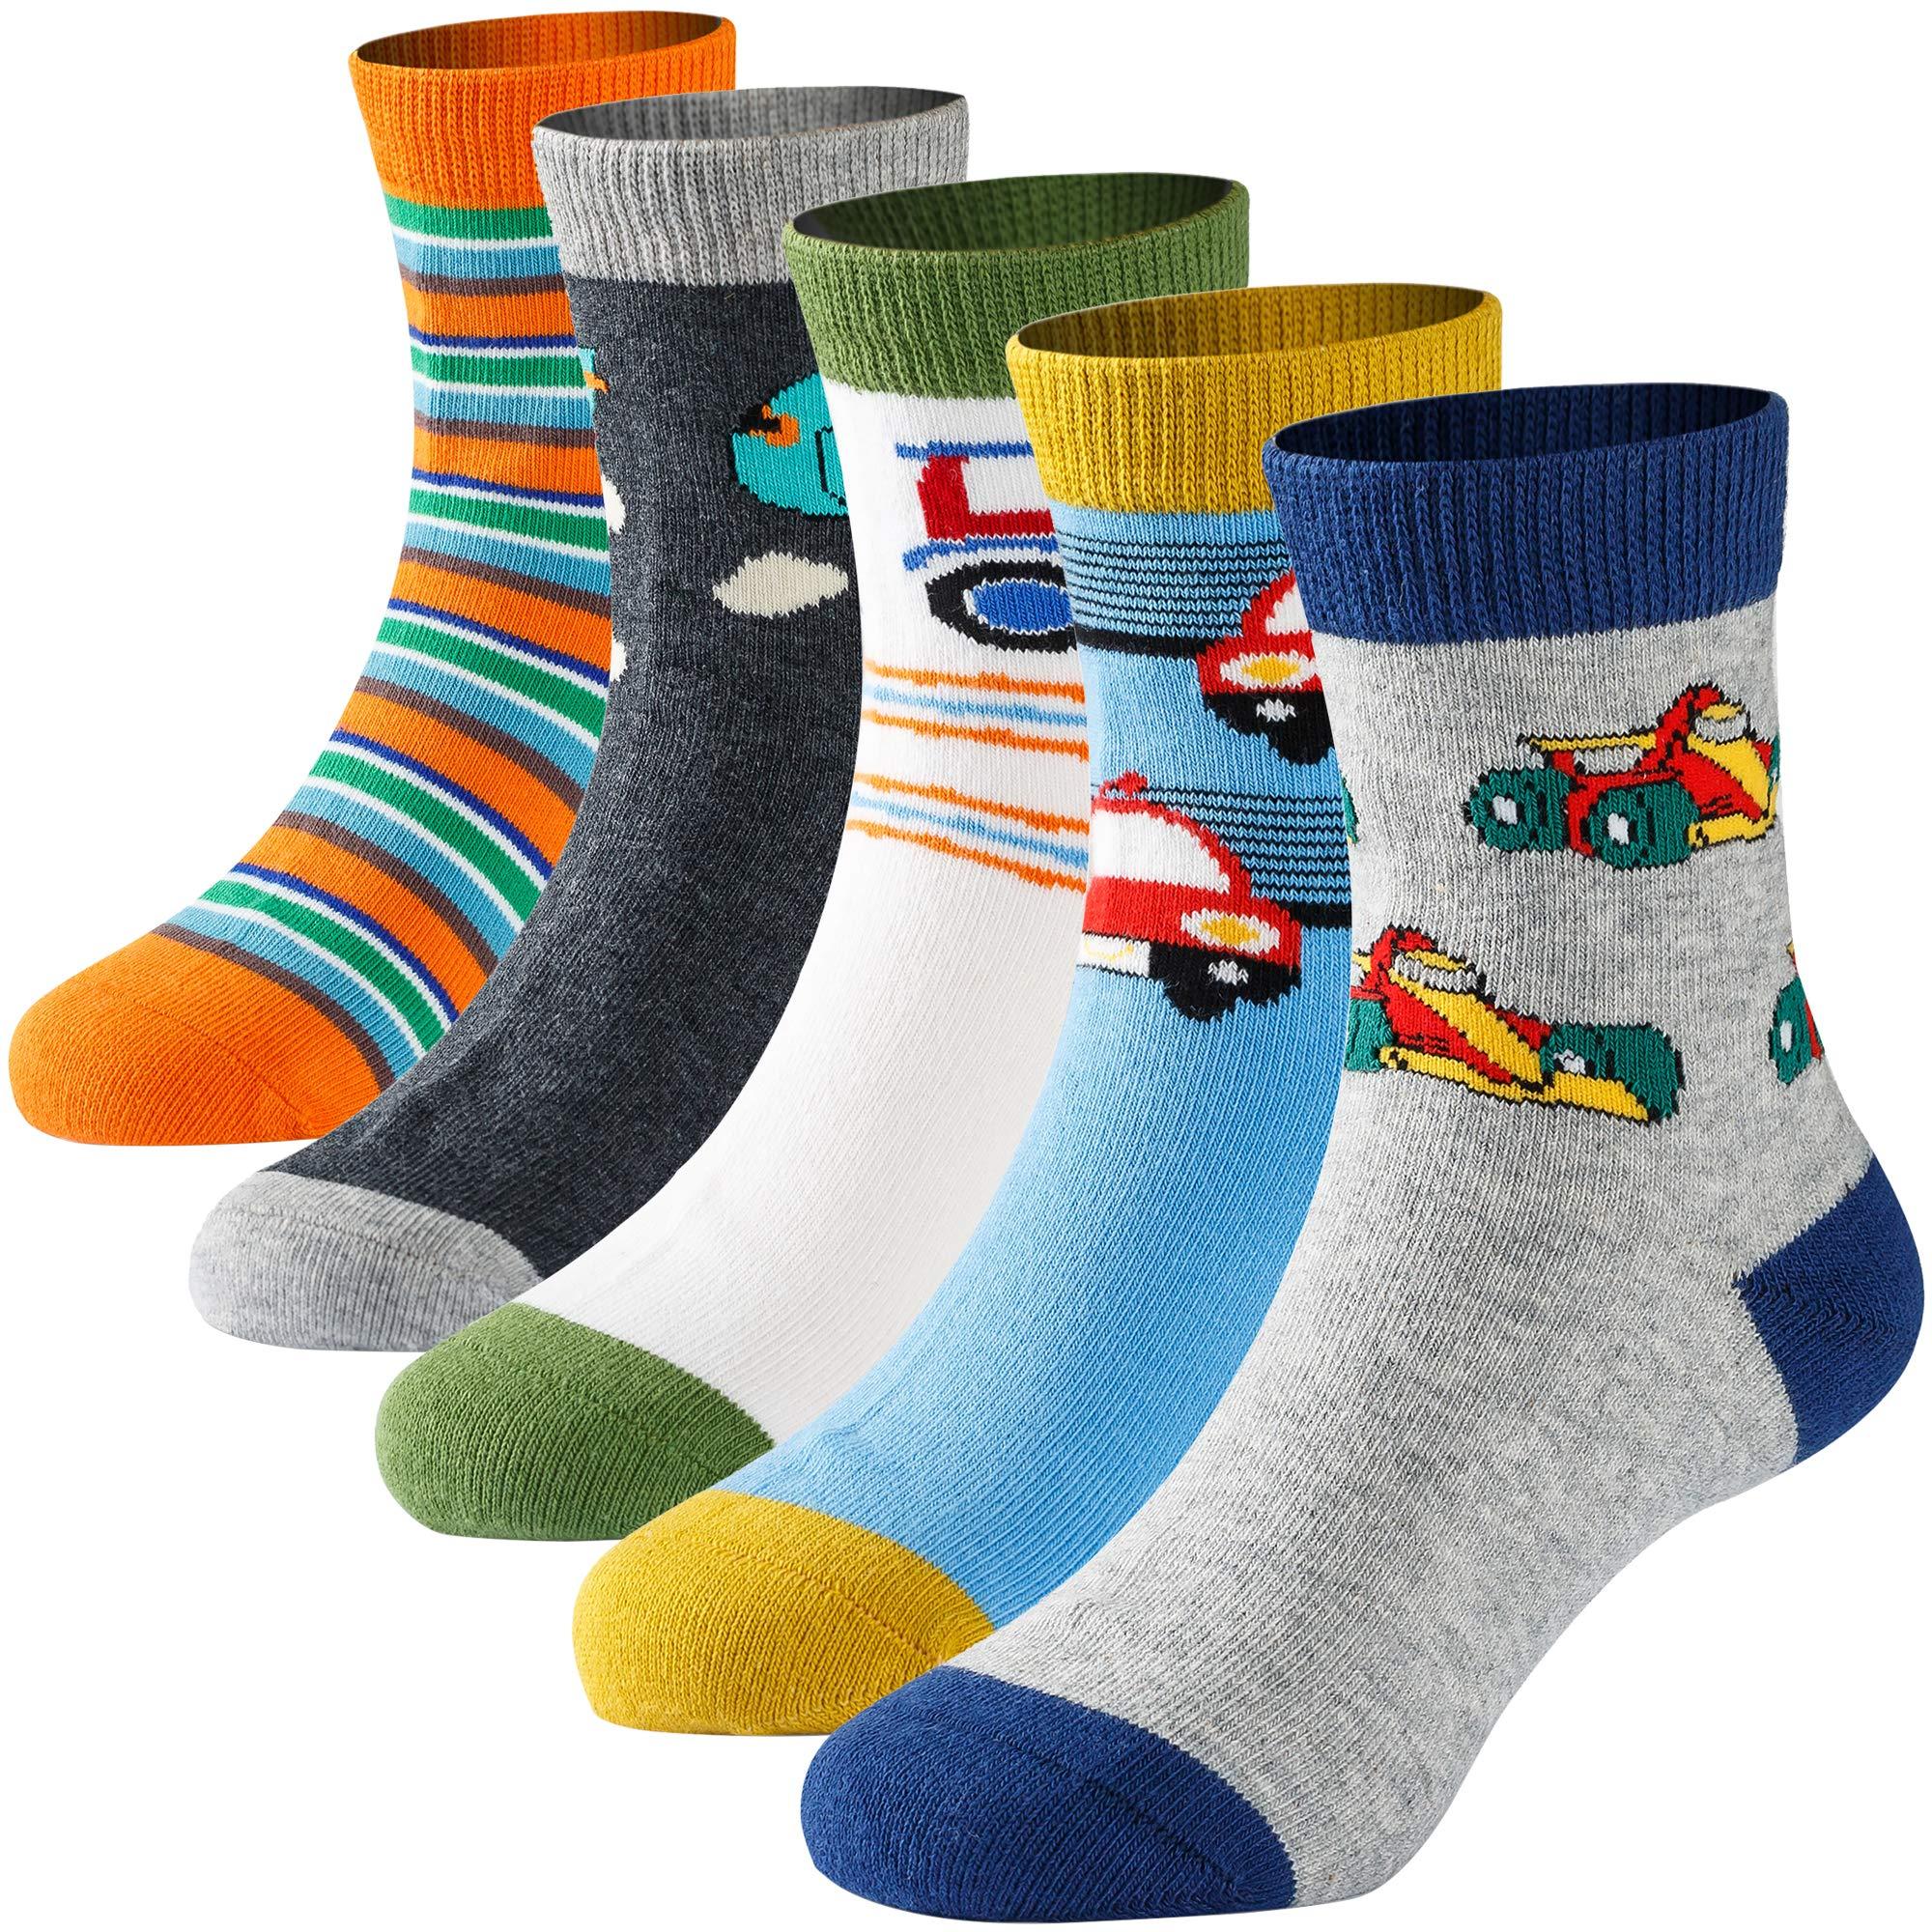 Boys' Crew Socks Kids Toddler Little Boys Fashion Seamless Cartoon Car Cotton Athletic Socks 5 Pairs Pack 3-5 Years